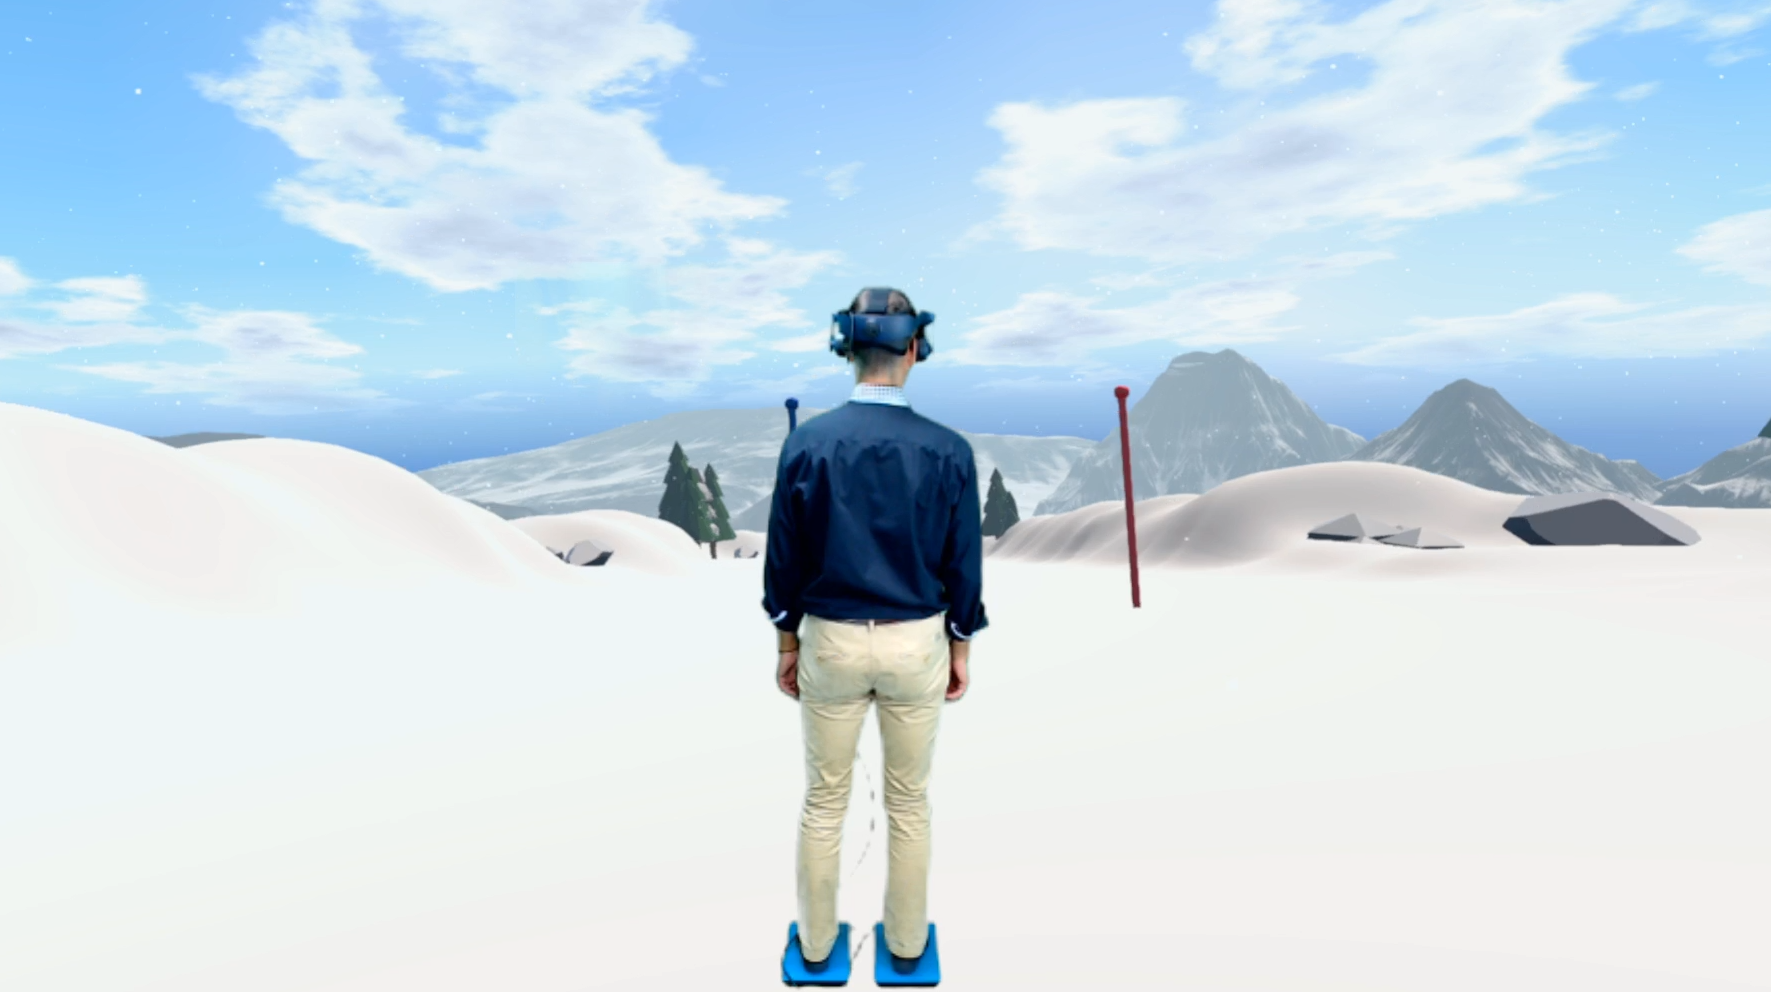 Rééducation Posturographie statique - Ski - Virtualis VR